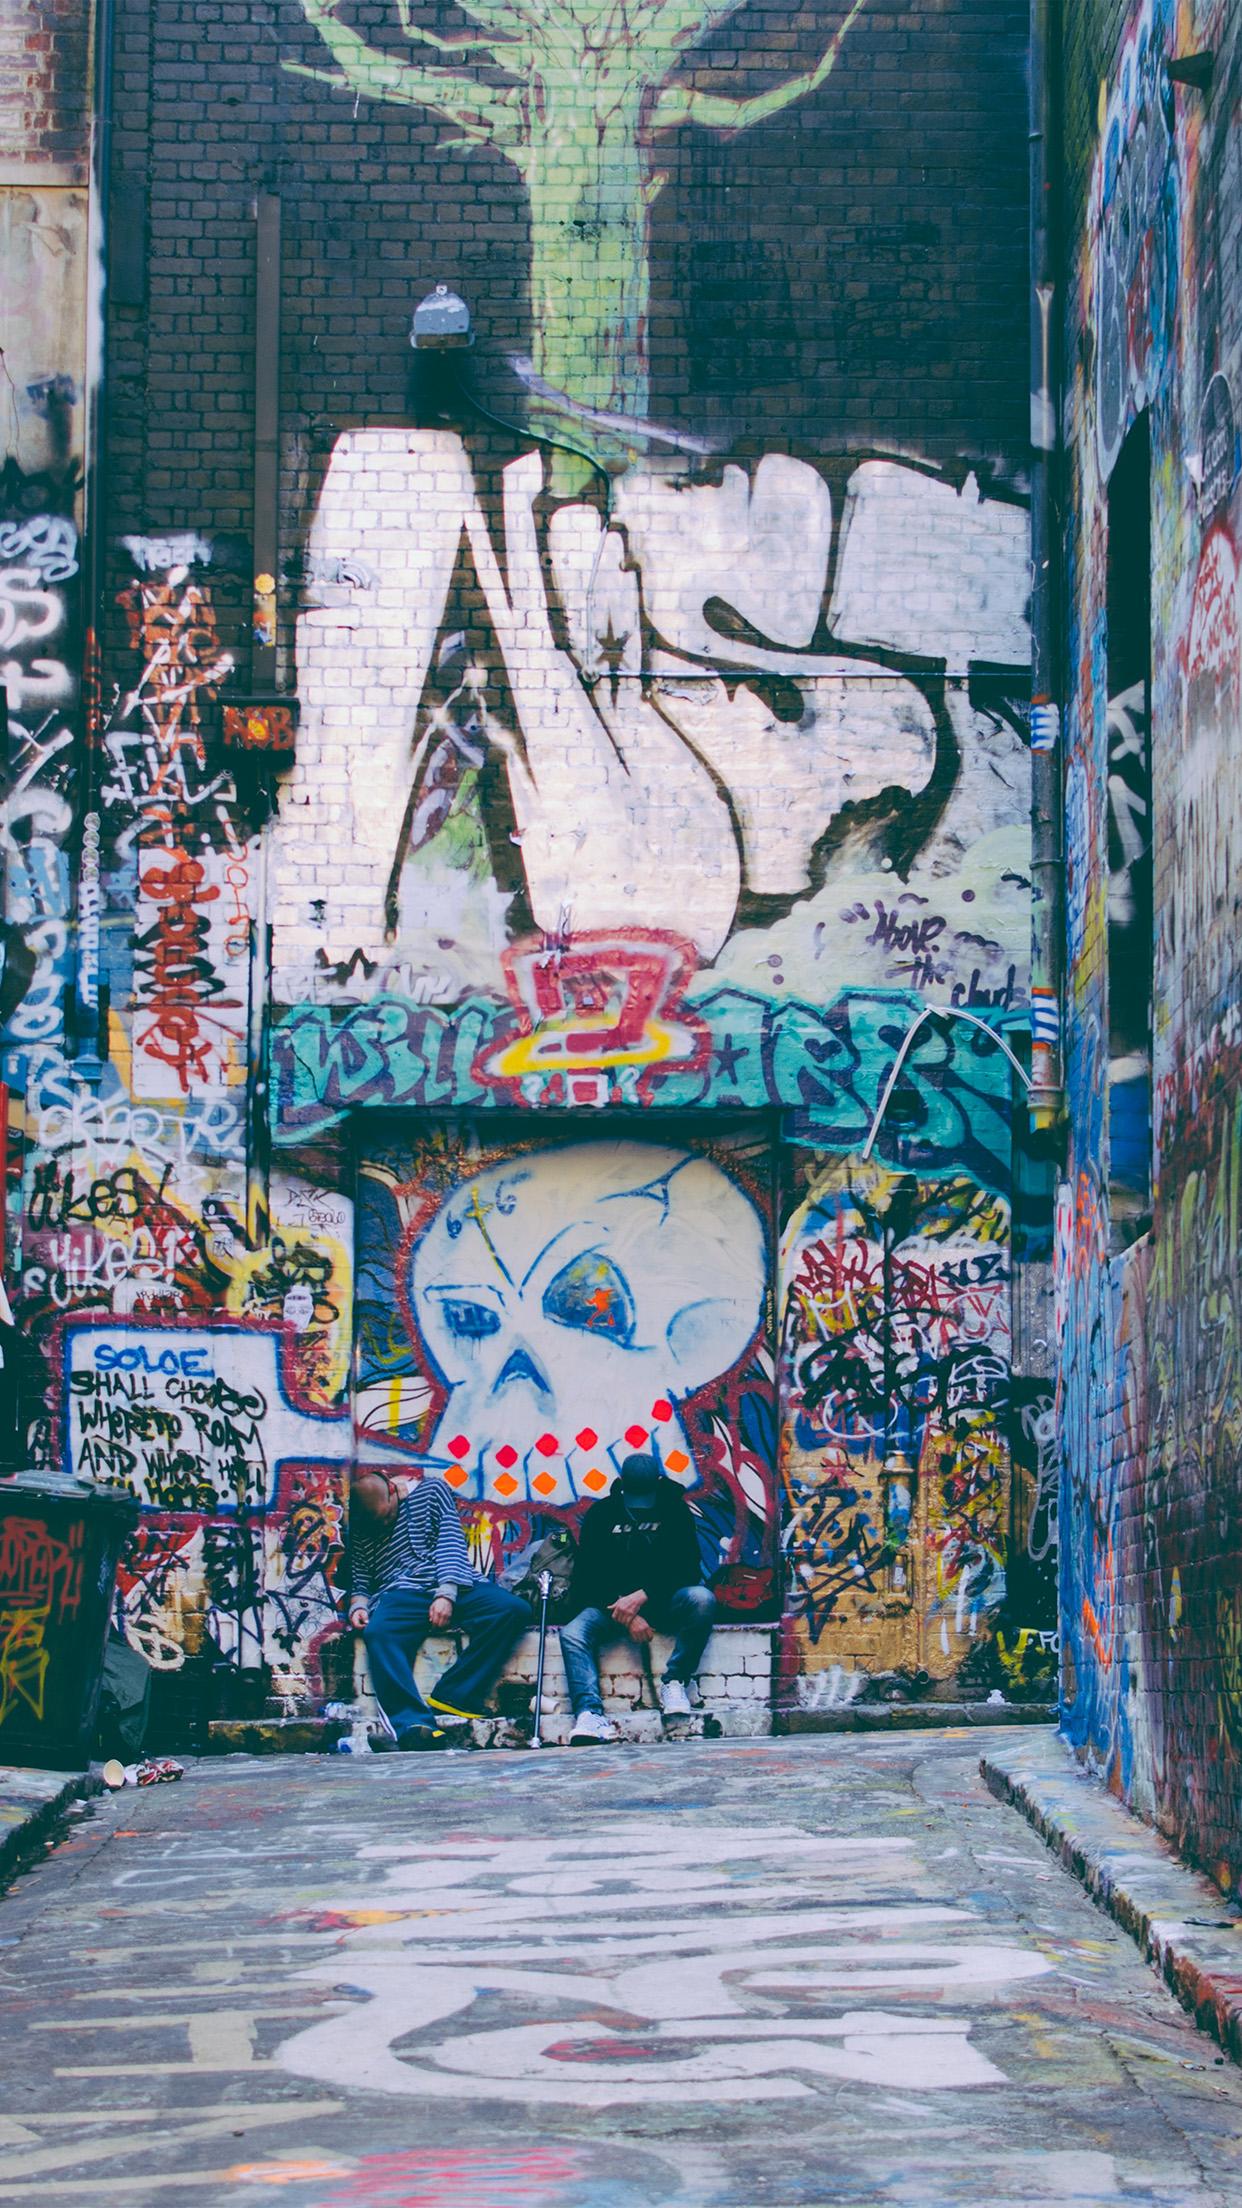 Iphone7paperscom Iphone7 Wallpaper Nj52 Grarfiti Street